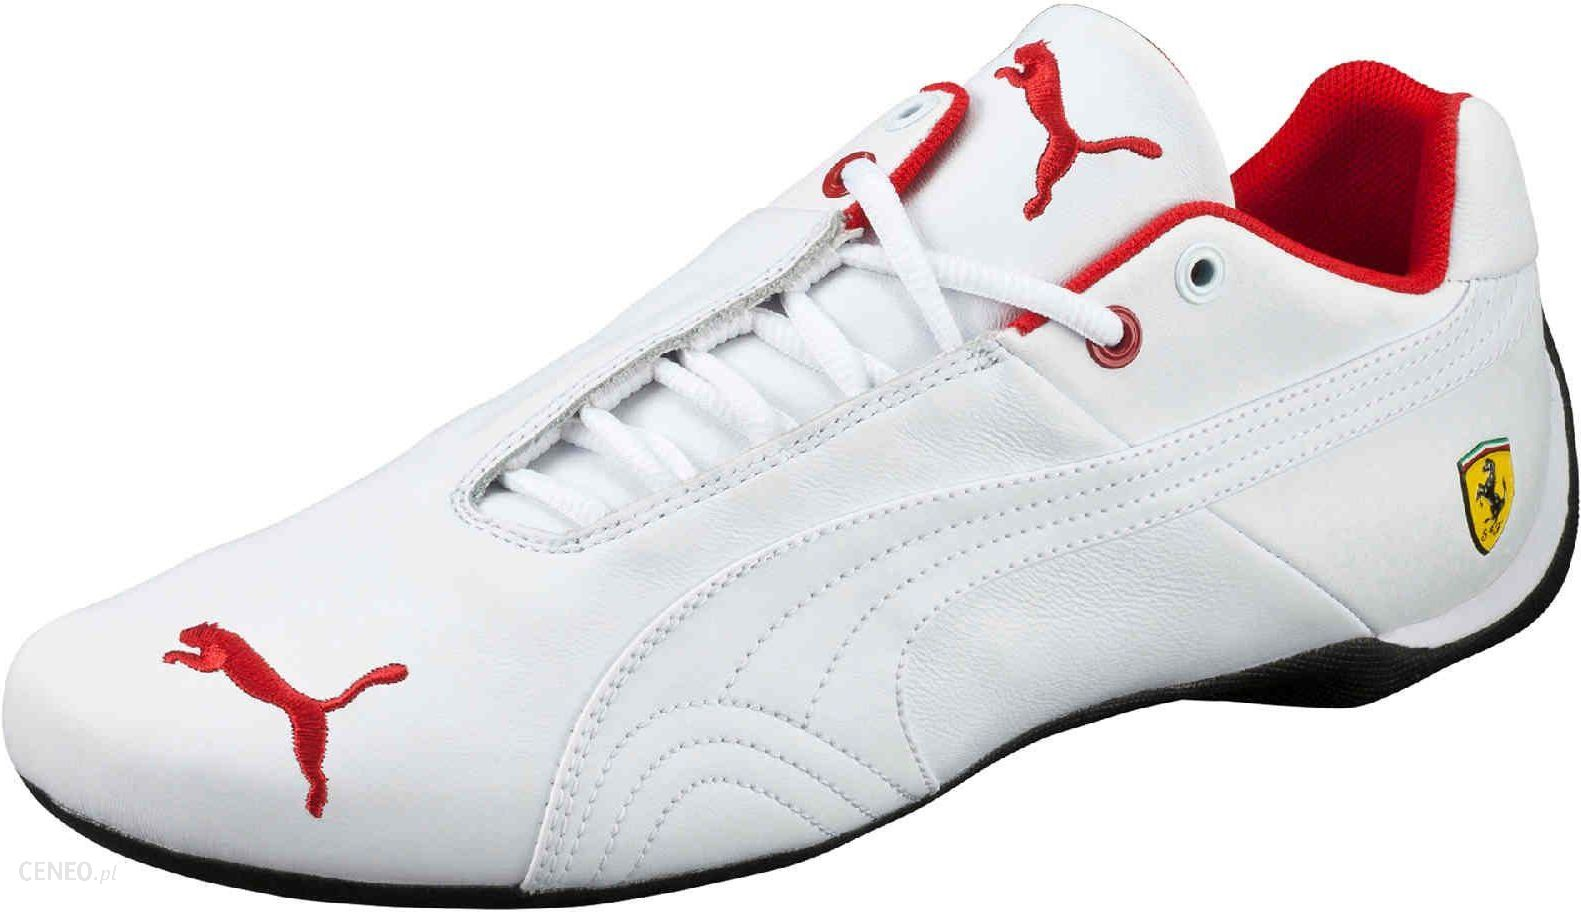 online store 868cb bc64f Puma buty Future Cat Leather SF - White-White 41, DOSTAWA GRATIS, BEZPŁATNY